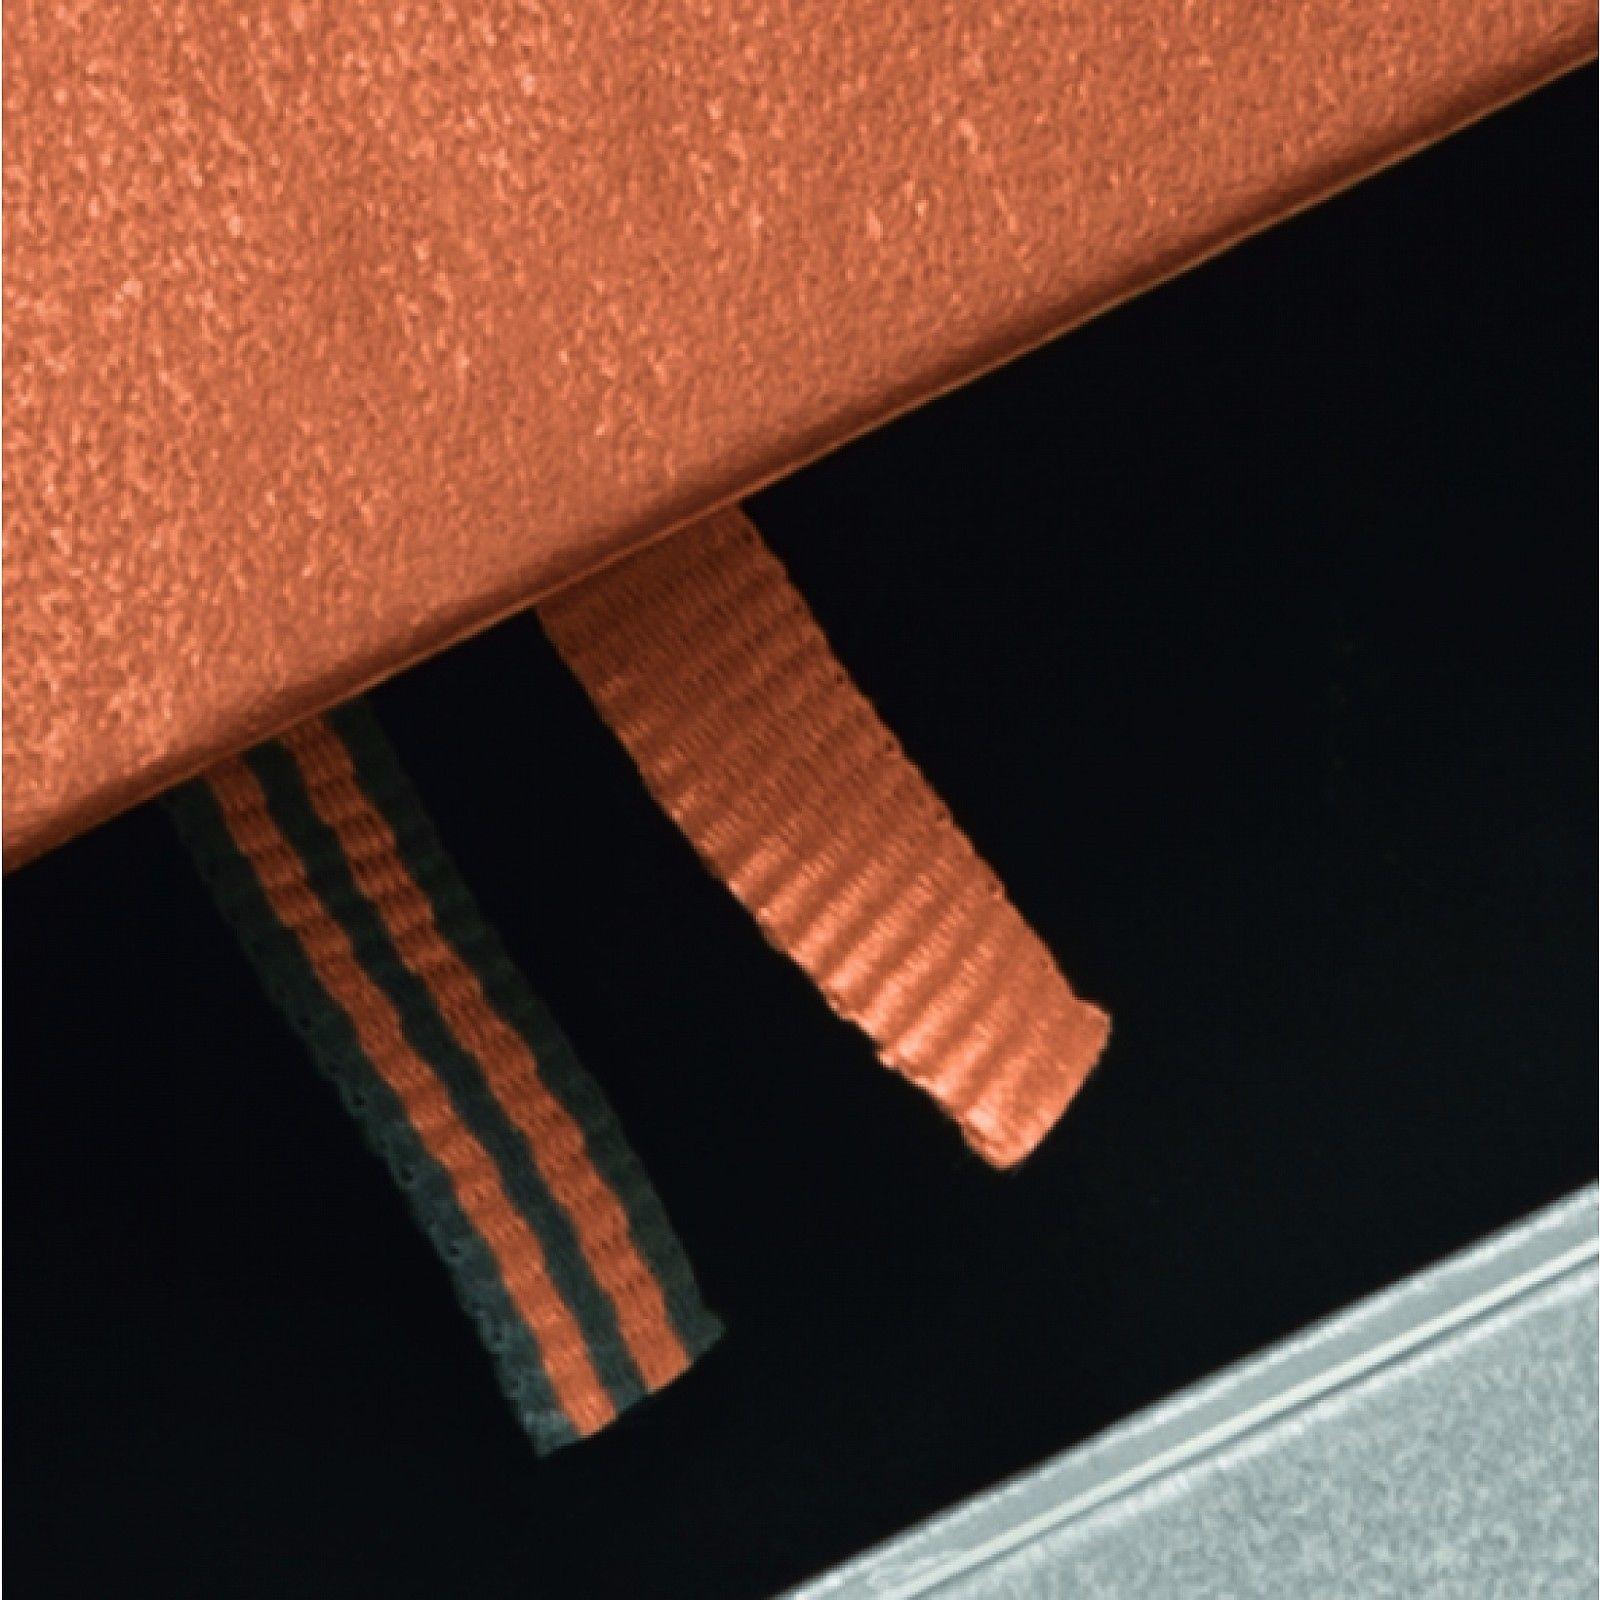 Leuchtturm1917-100Years-Metallic-Edition-A6-Hardback-Notebook-Gold-Silver-Copper-152488682213-4